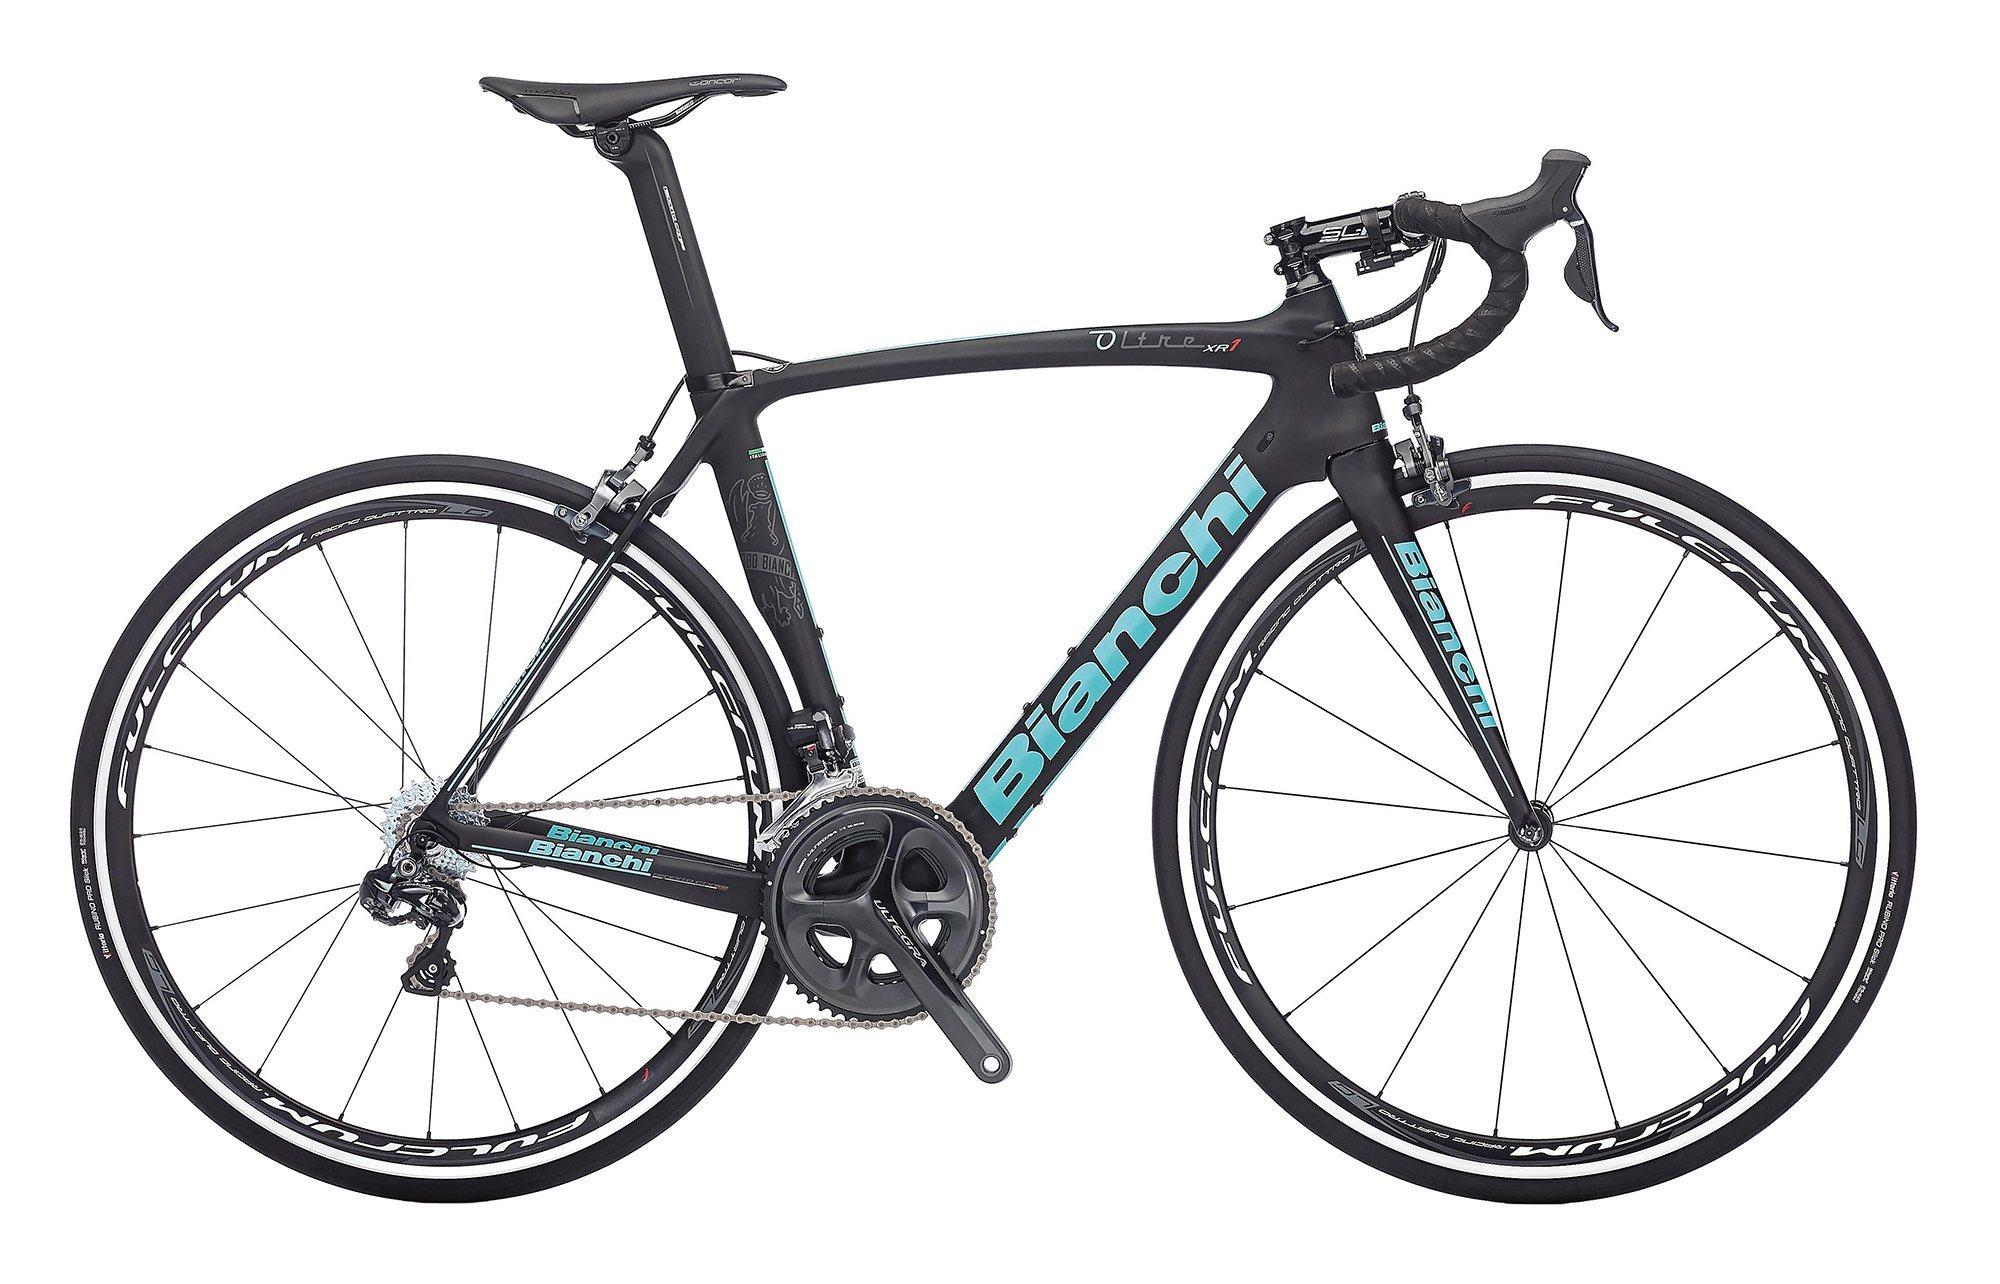 Bianchi Road Bikes | R&A Cycles